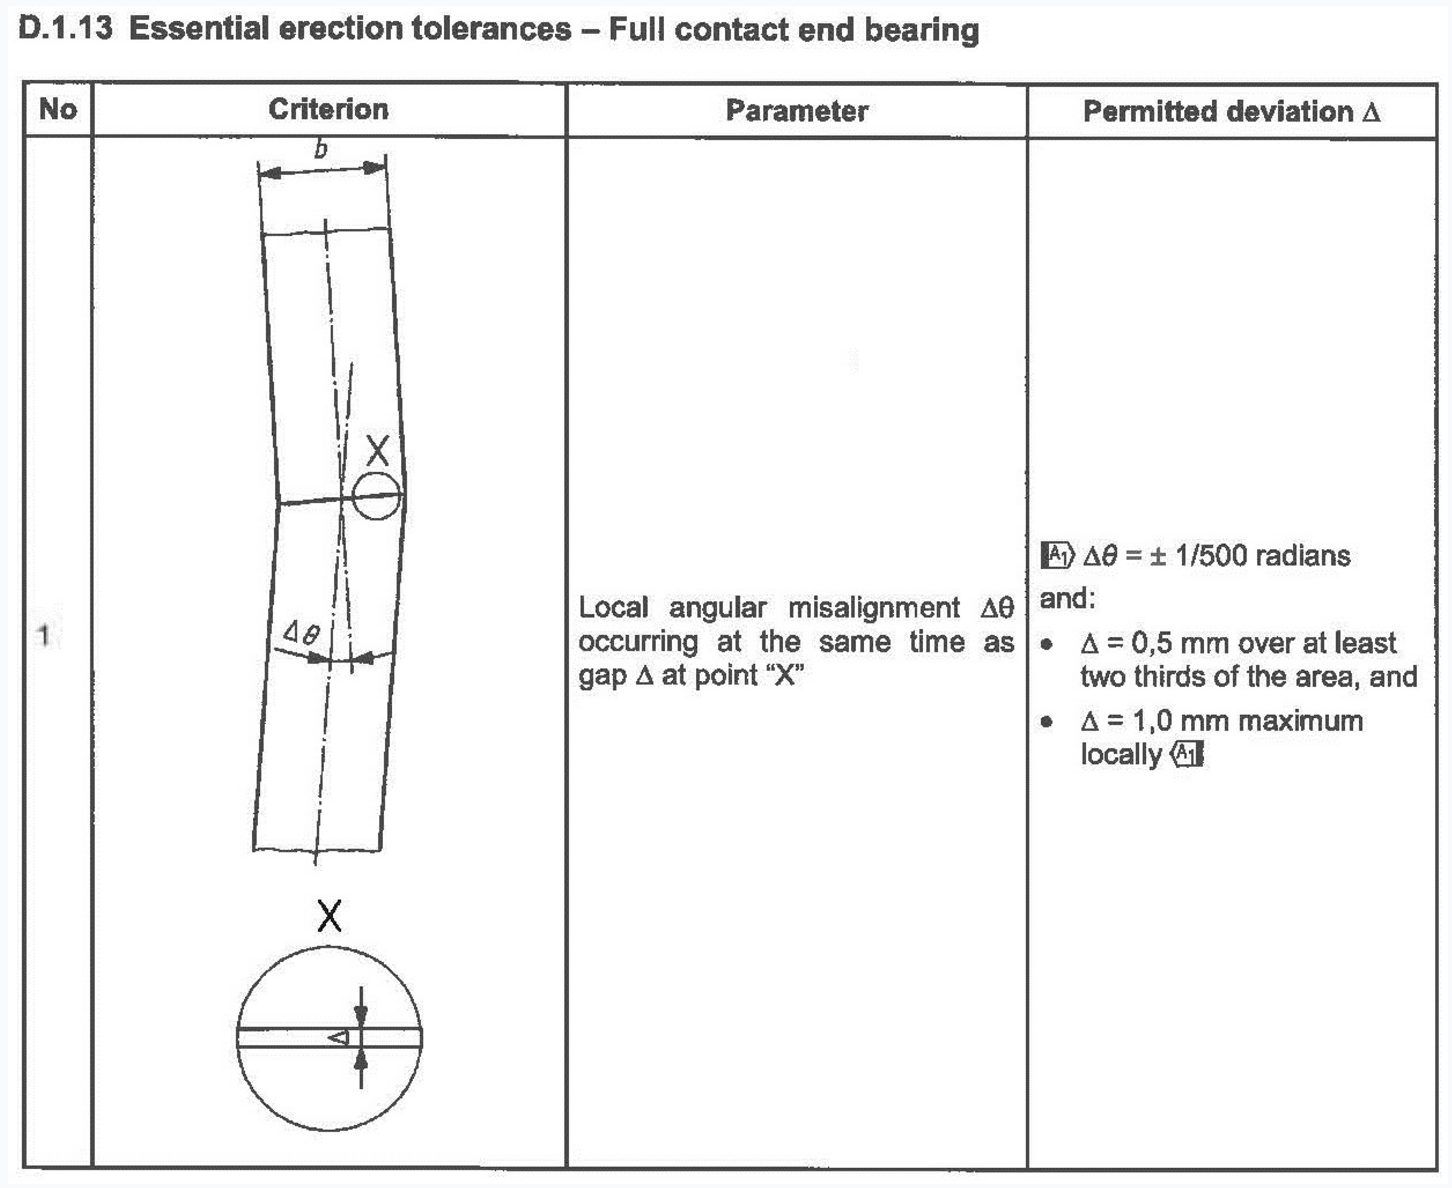 carpenterie metalliche, tolleranze essenziali